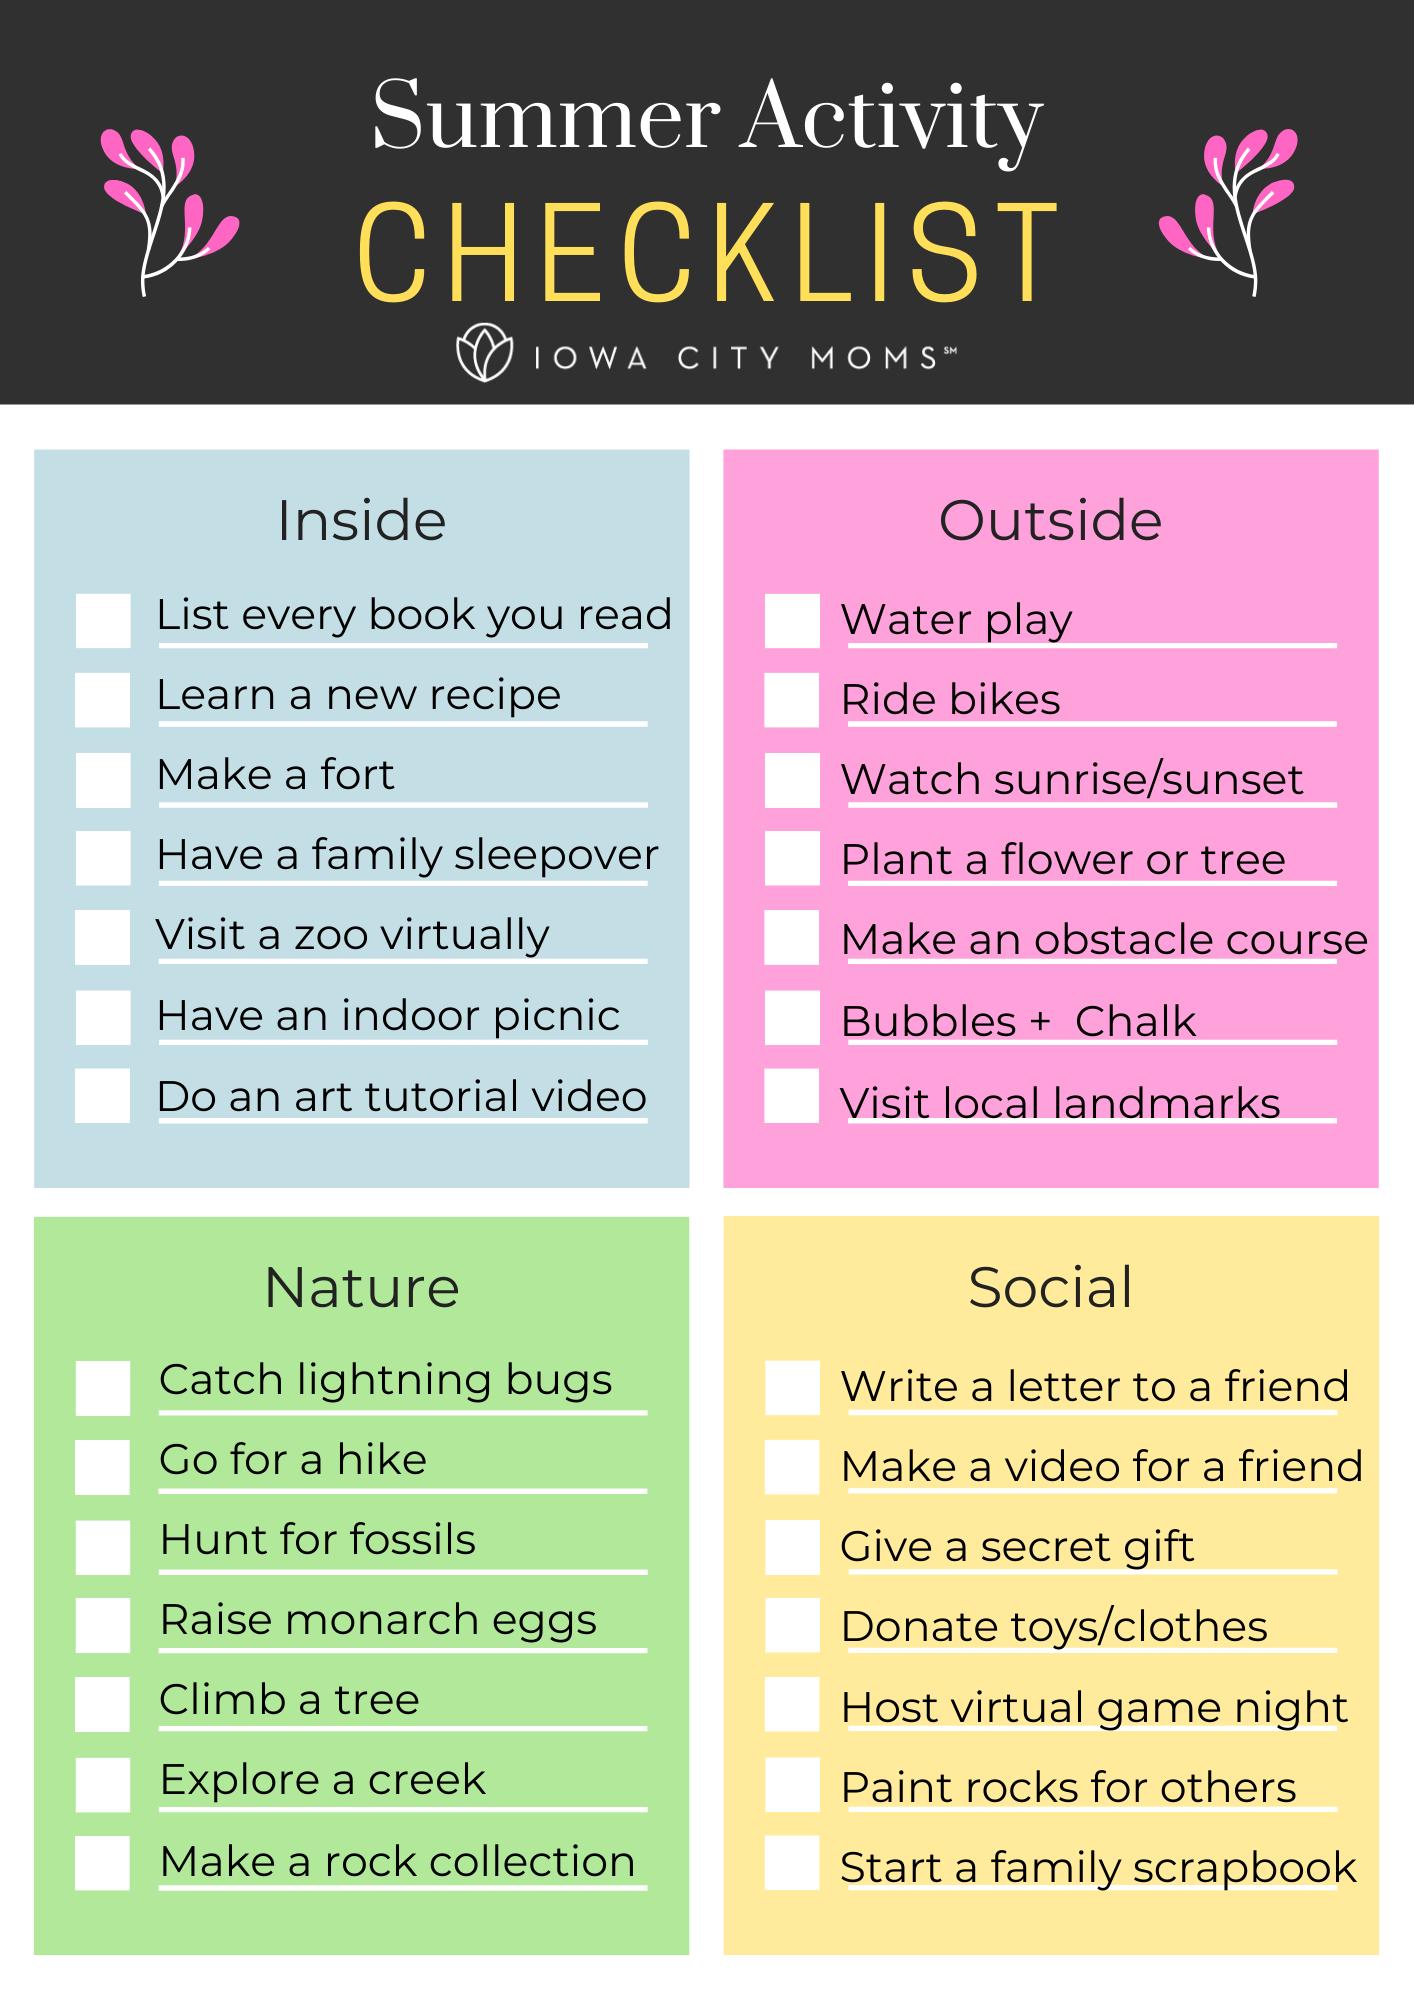 Summer Activity Checklist: Bucket List for Families